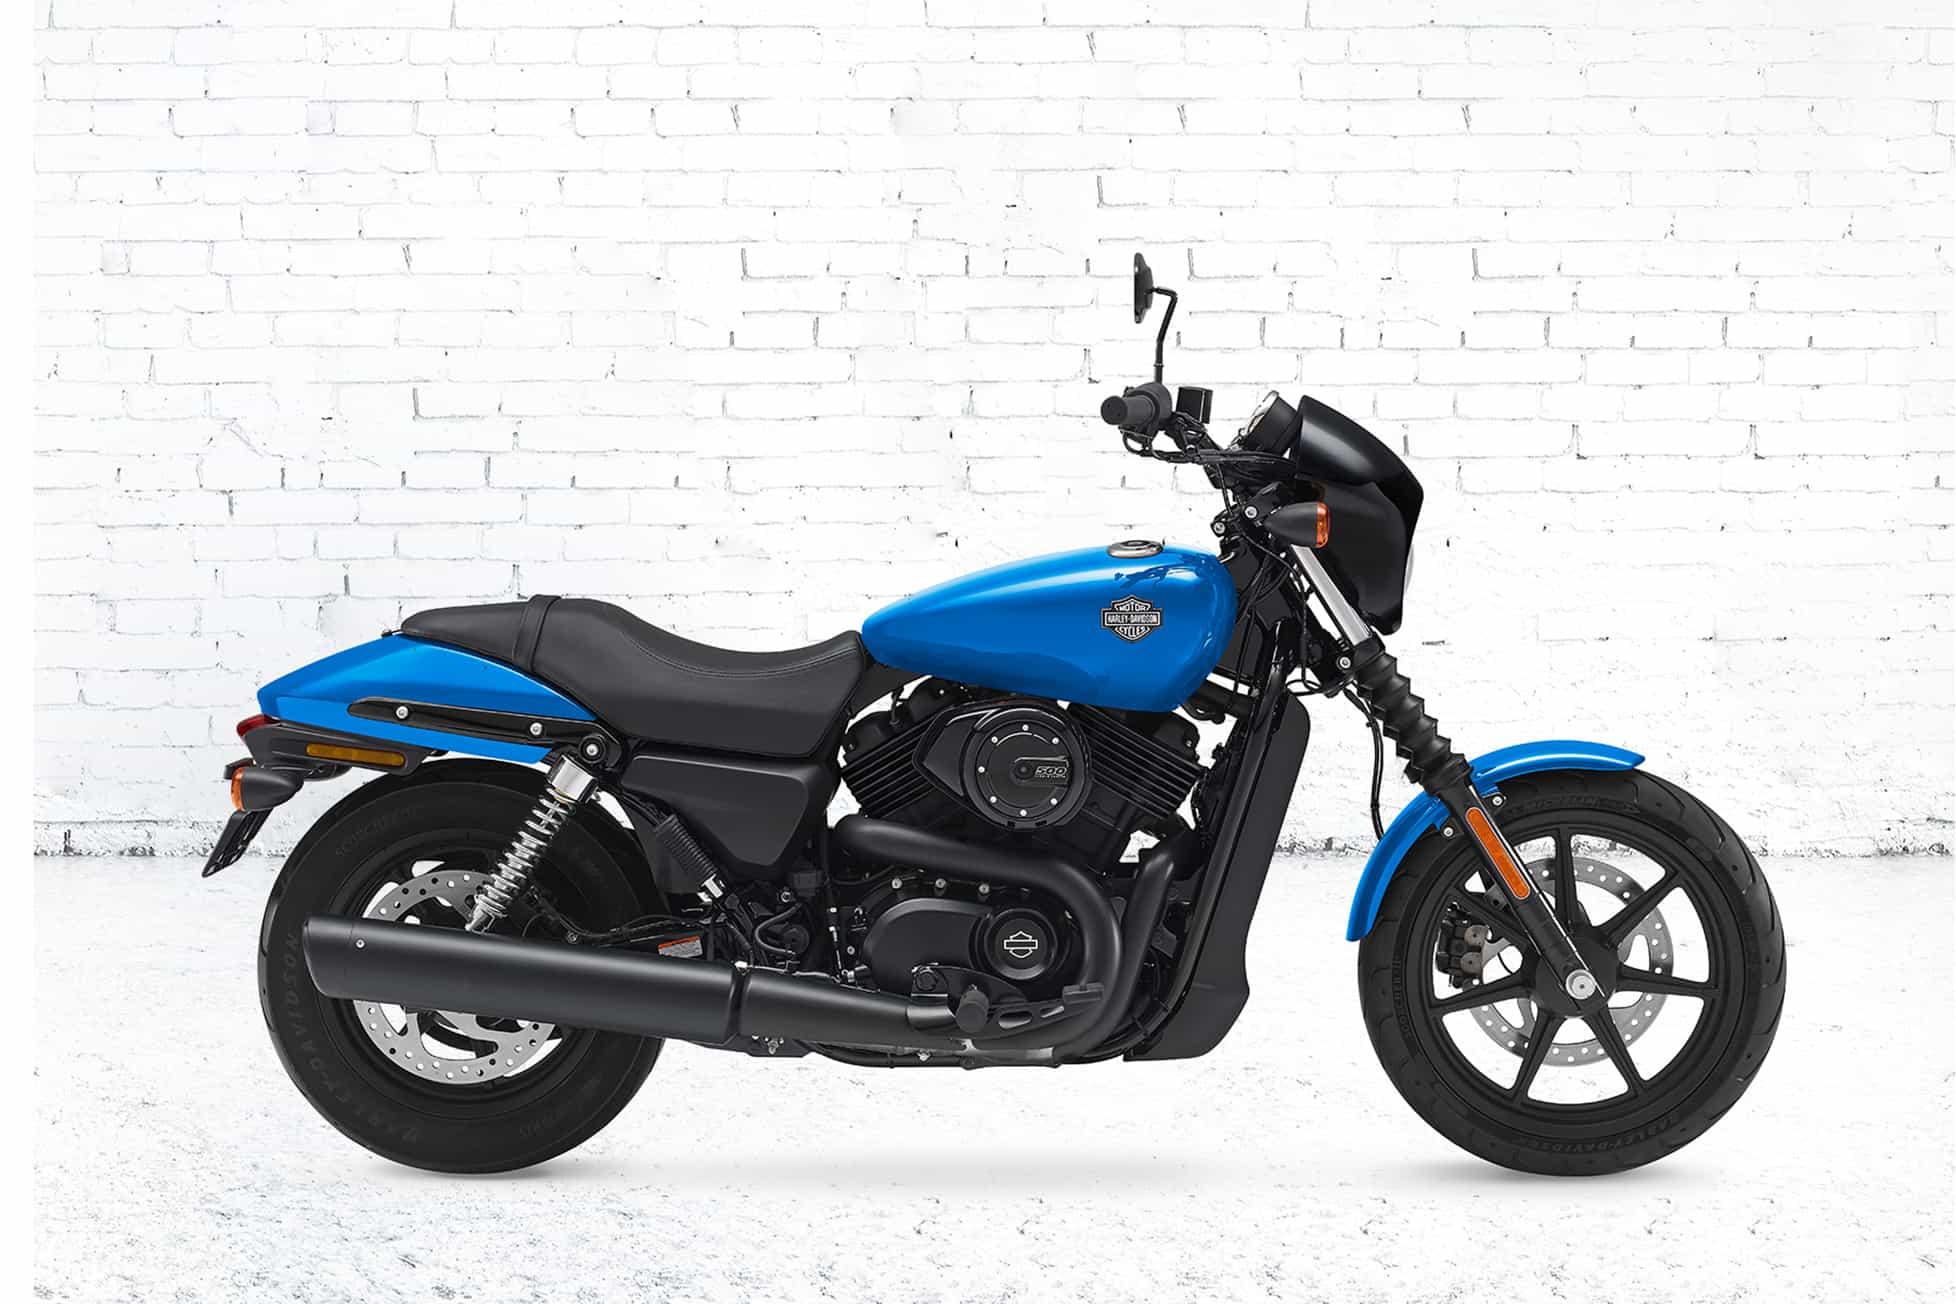 Harley davidson street 500 horsepower